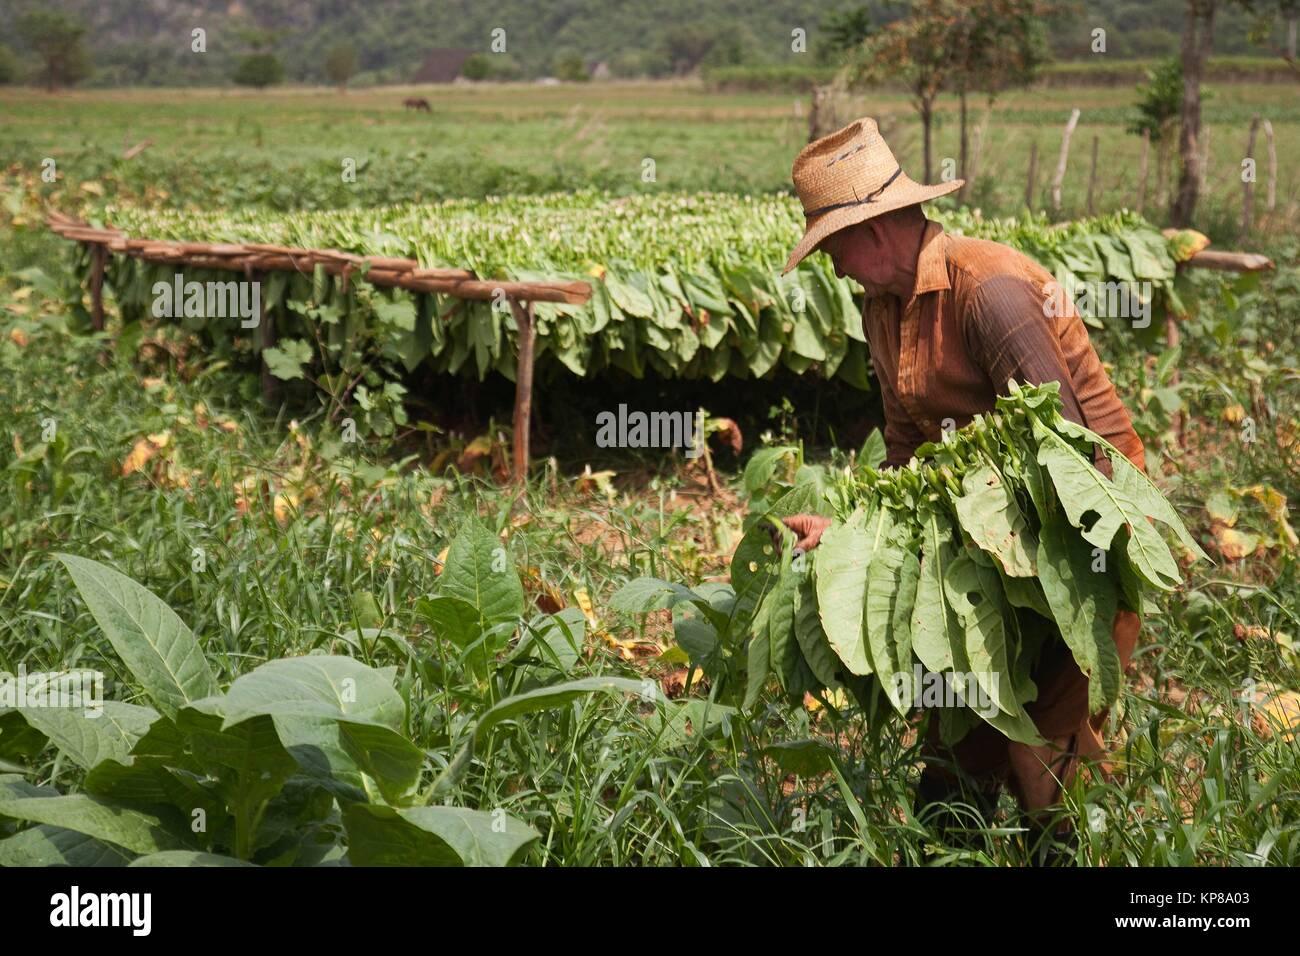 Farmer picking tobacco leaves in the valley, Vinales, Pinar del Rio Province, Cuba, Central America - Stock Image